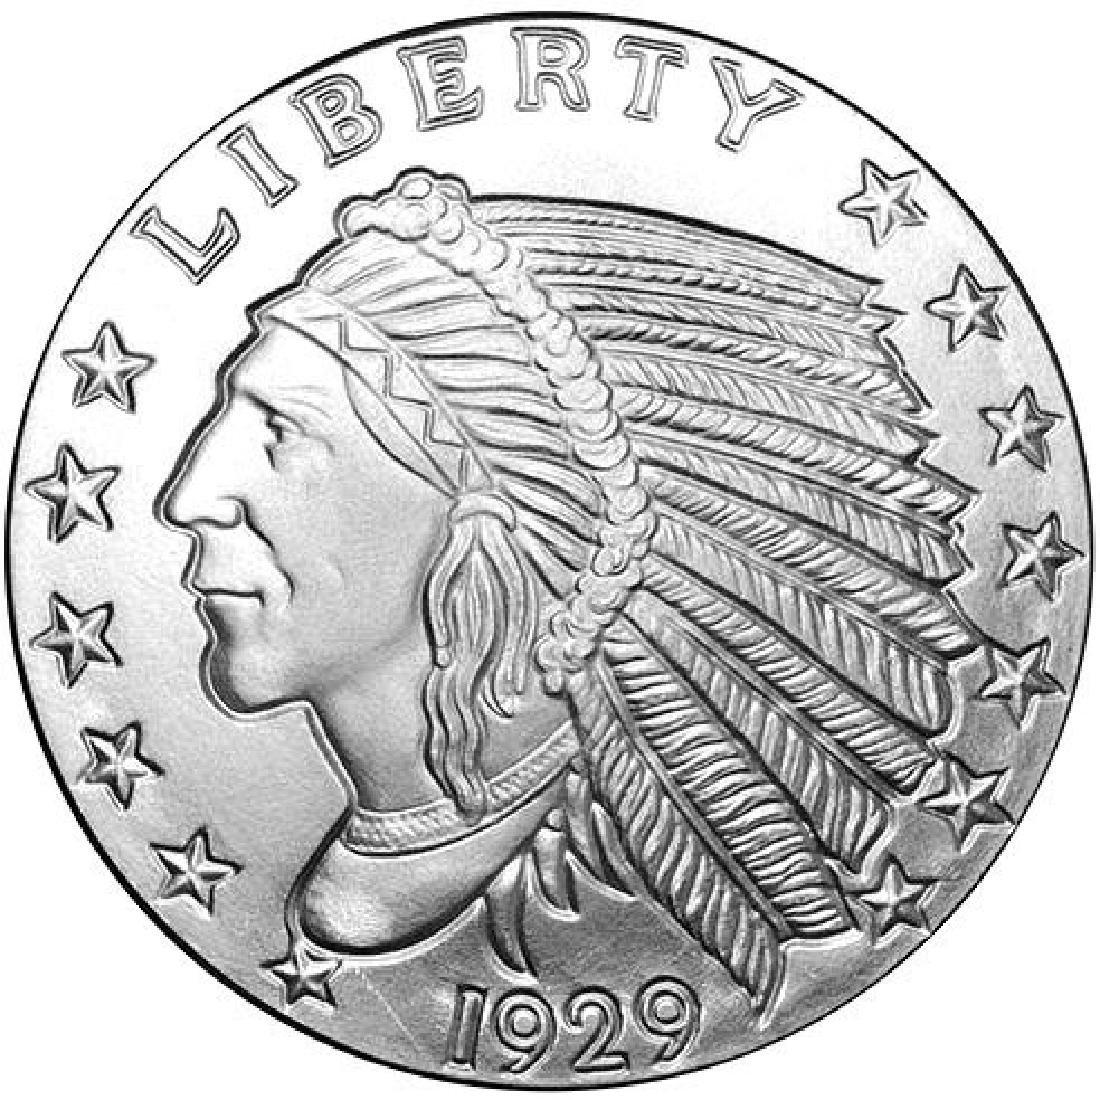 Silver Bullion 5 oz Indian Round .999 fine